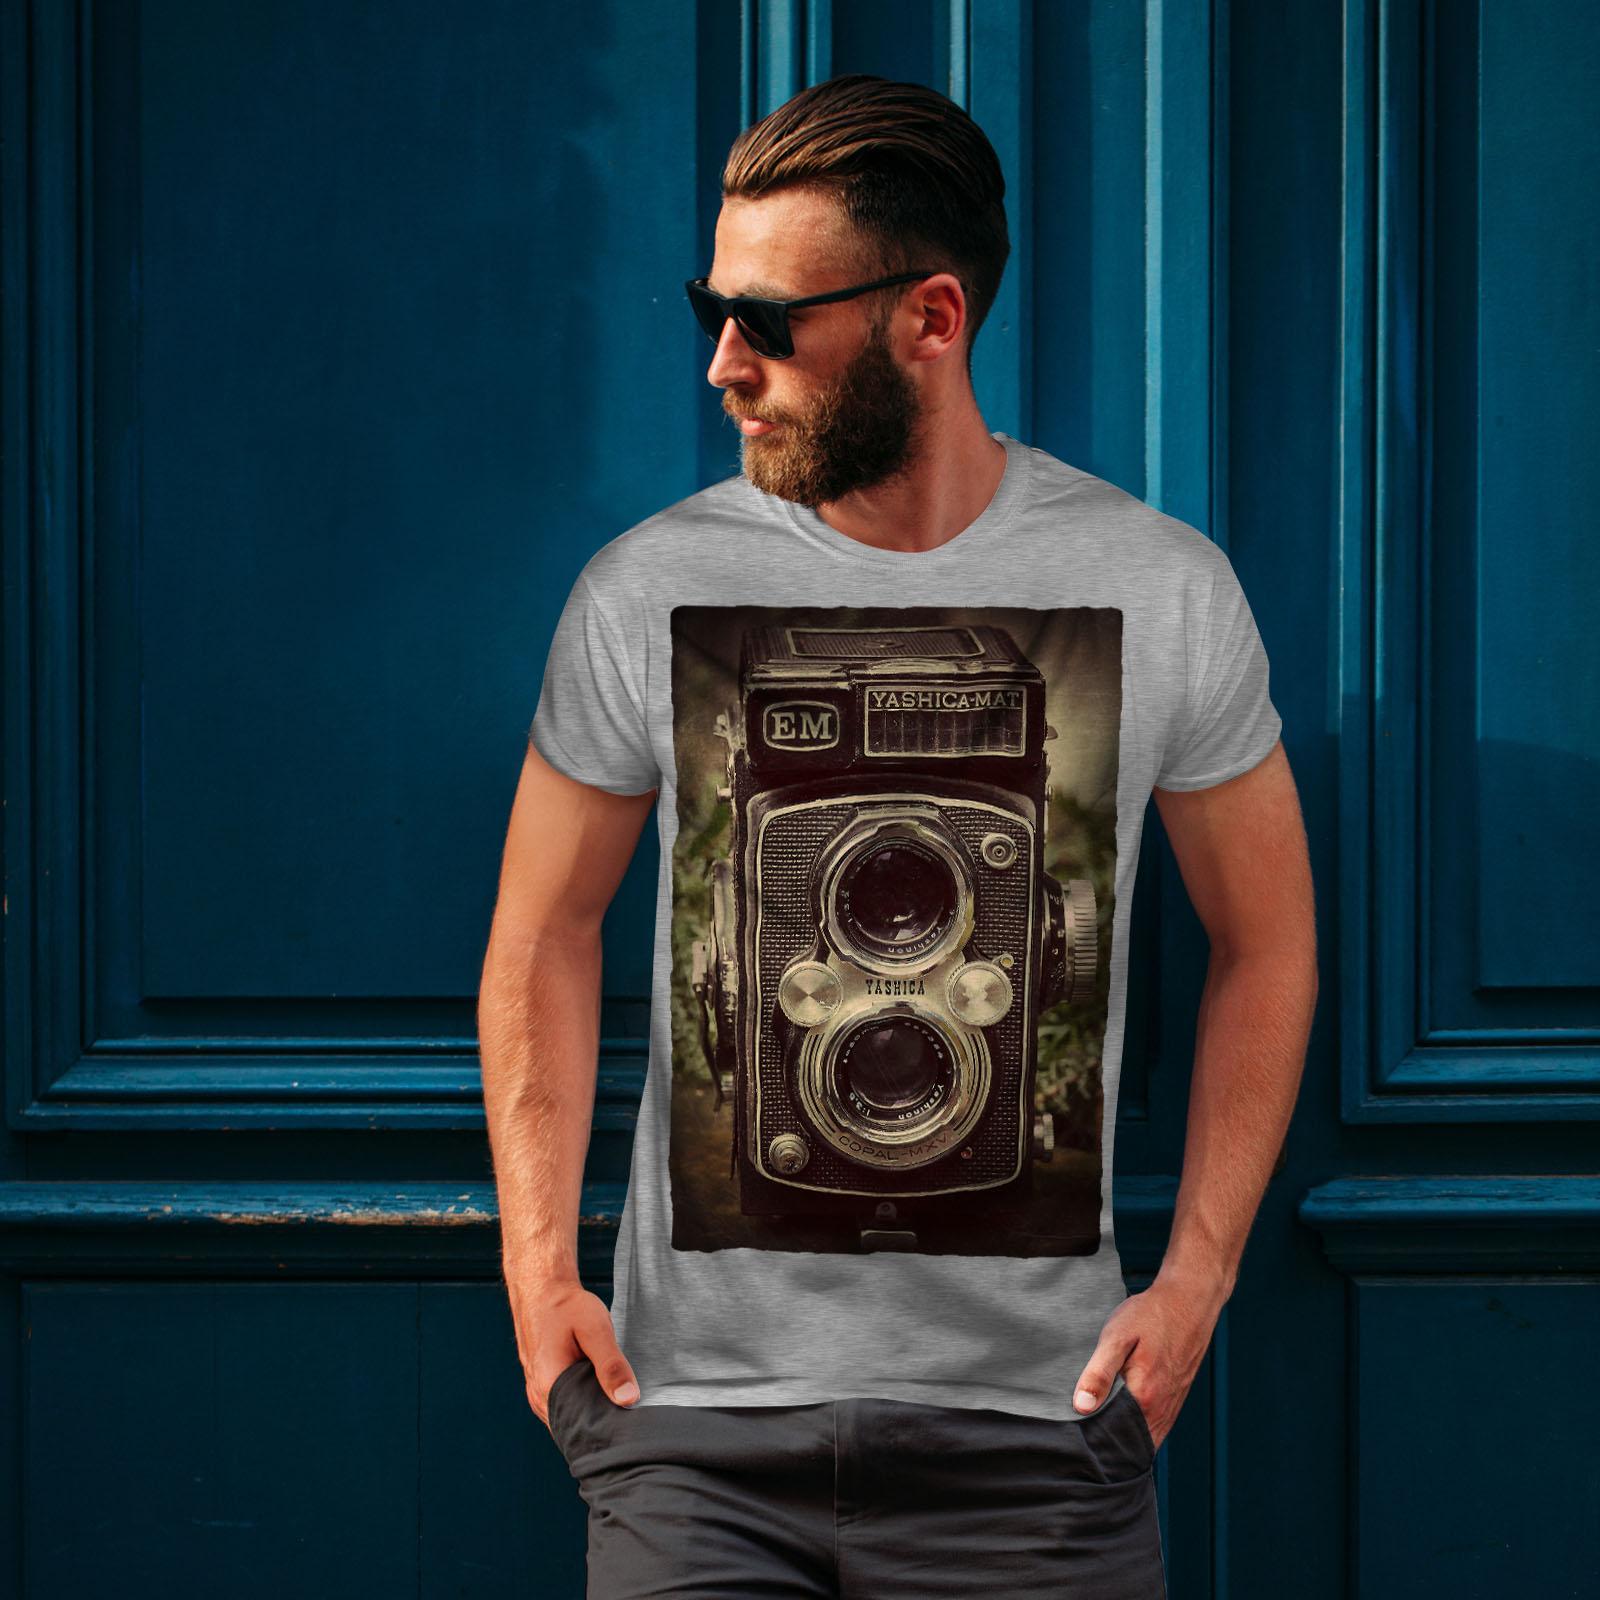 Wellcoda-Old-Foto-Camera-Mens-T-shirt-Retro-Graphic-Design-Printed-Tee thumbnail 16